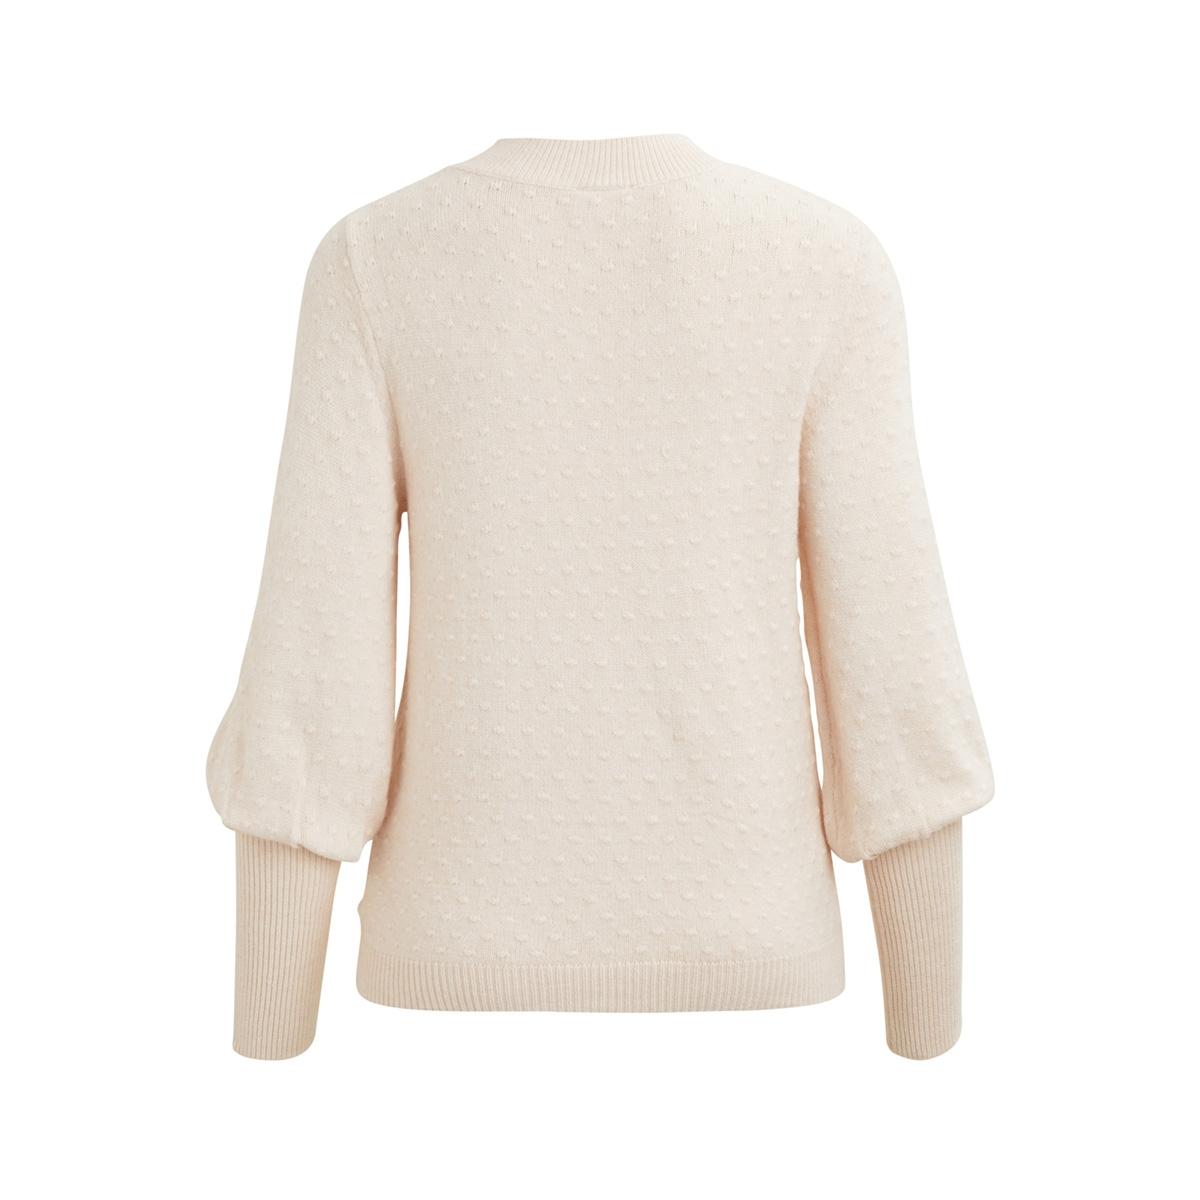 visinai l/s knit top 14044423 vila trui peach blush